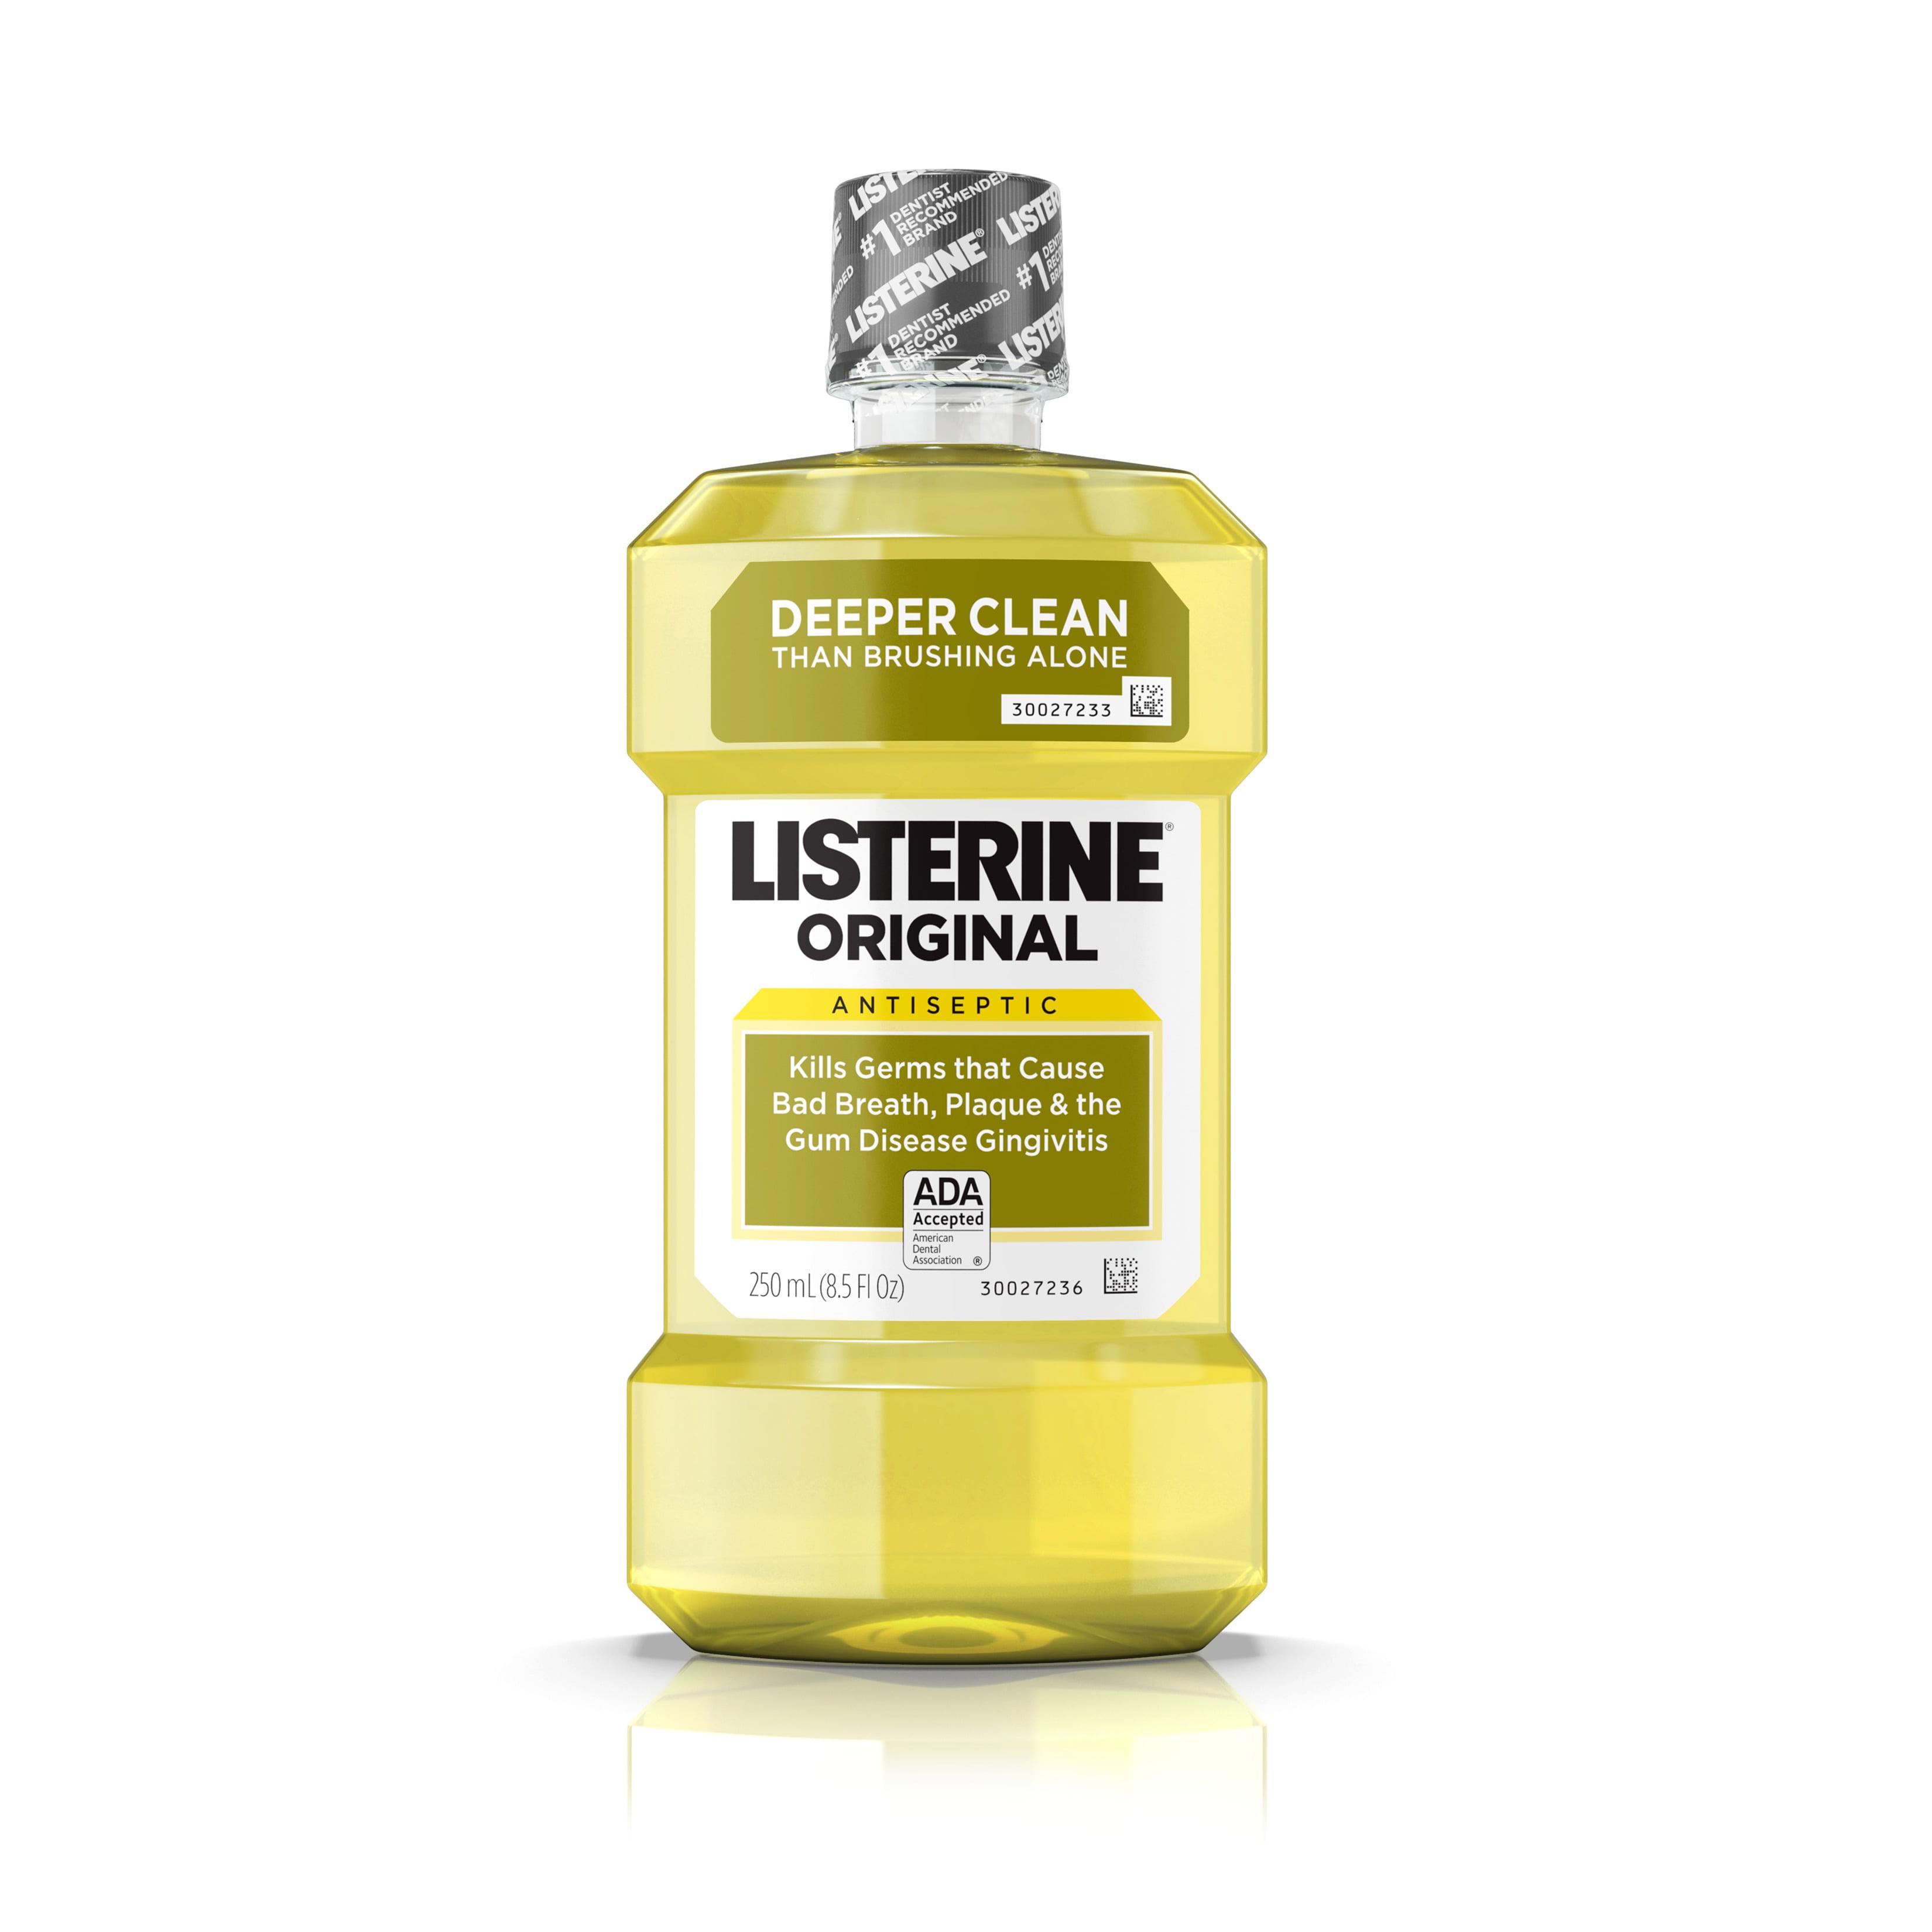 Listerine Original Antiseptic Oral Care Mouthwash, 250 mL